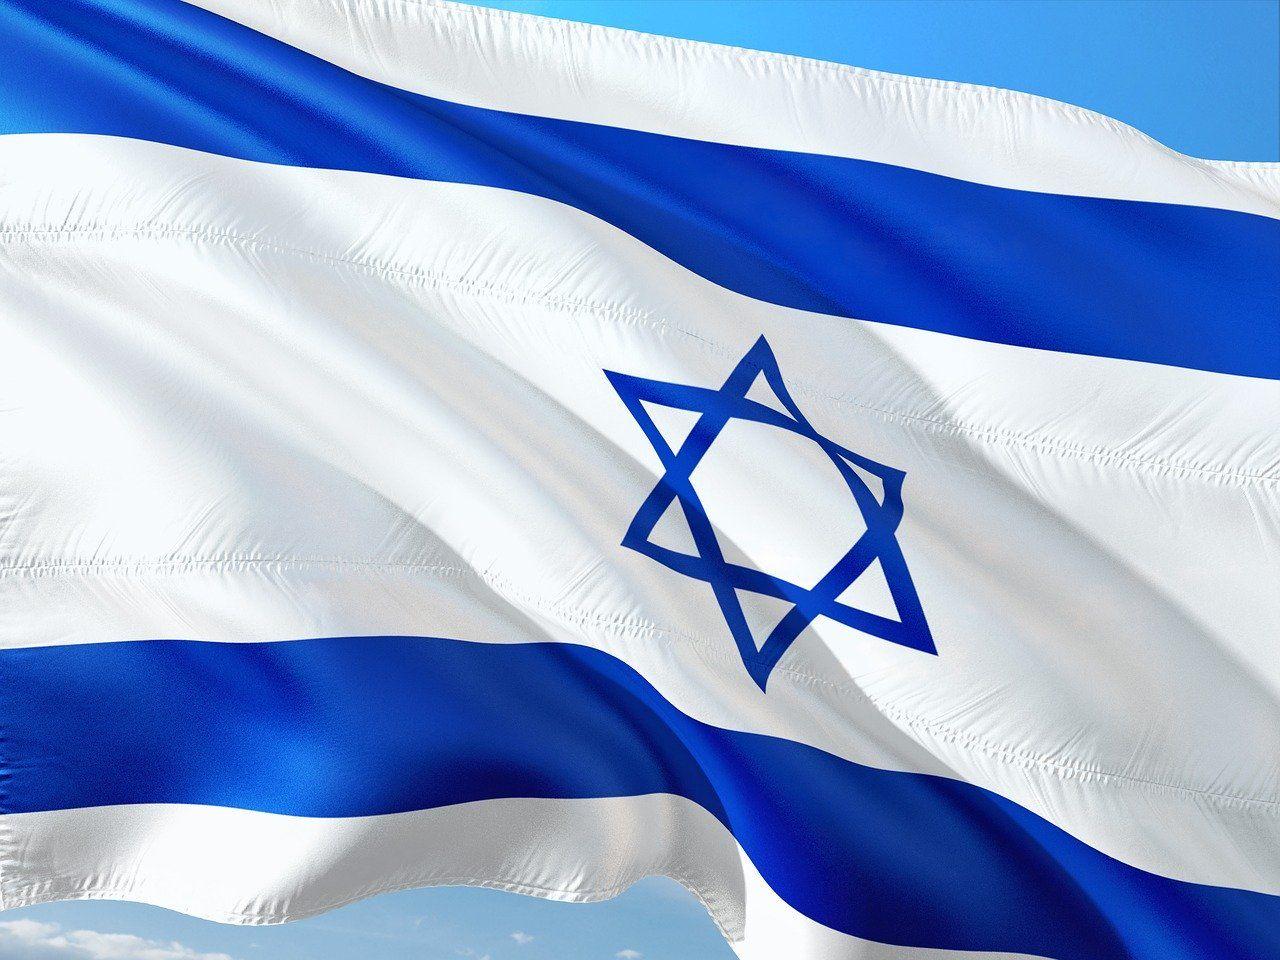 """Угроза прорыва ХАМАС"", – Израиль объявил режим ЧП на границе с Газой"